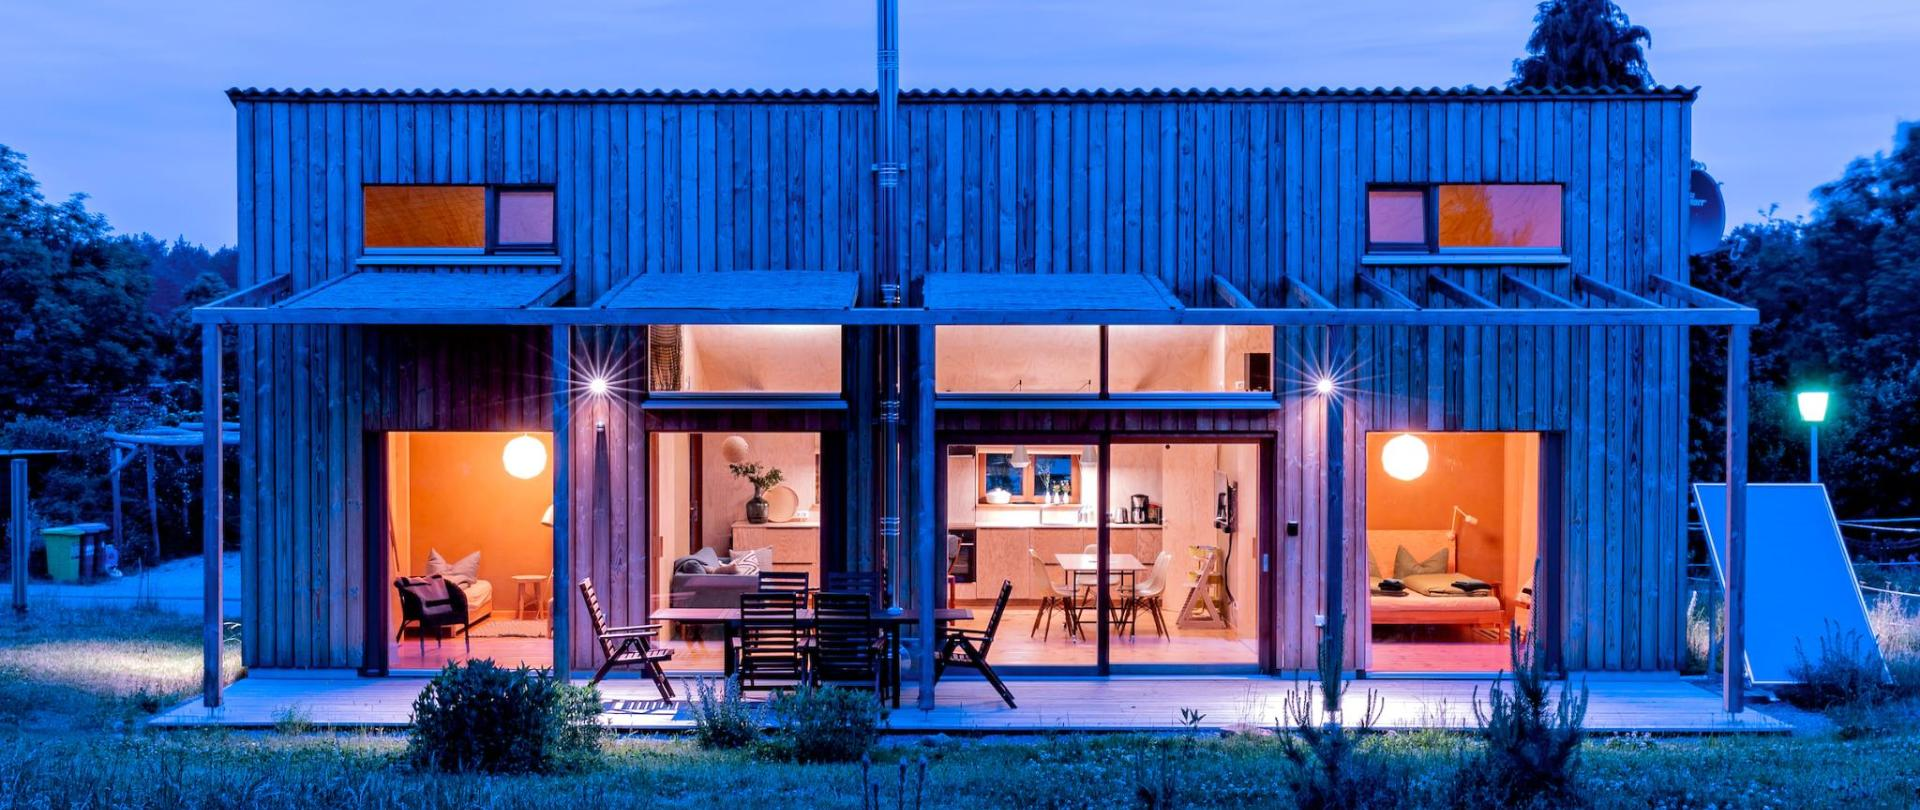 Studio Zempow ökologisches Holzhaus Fotostudio